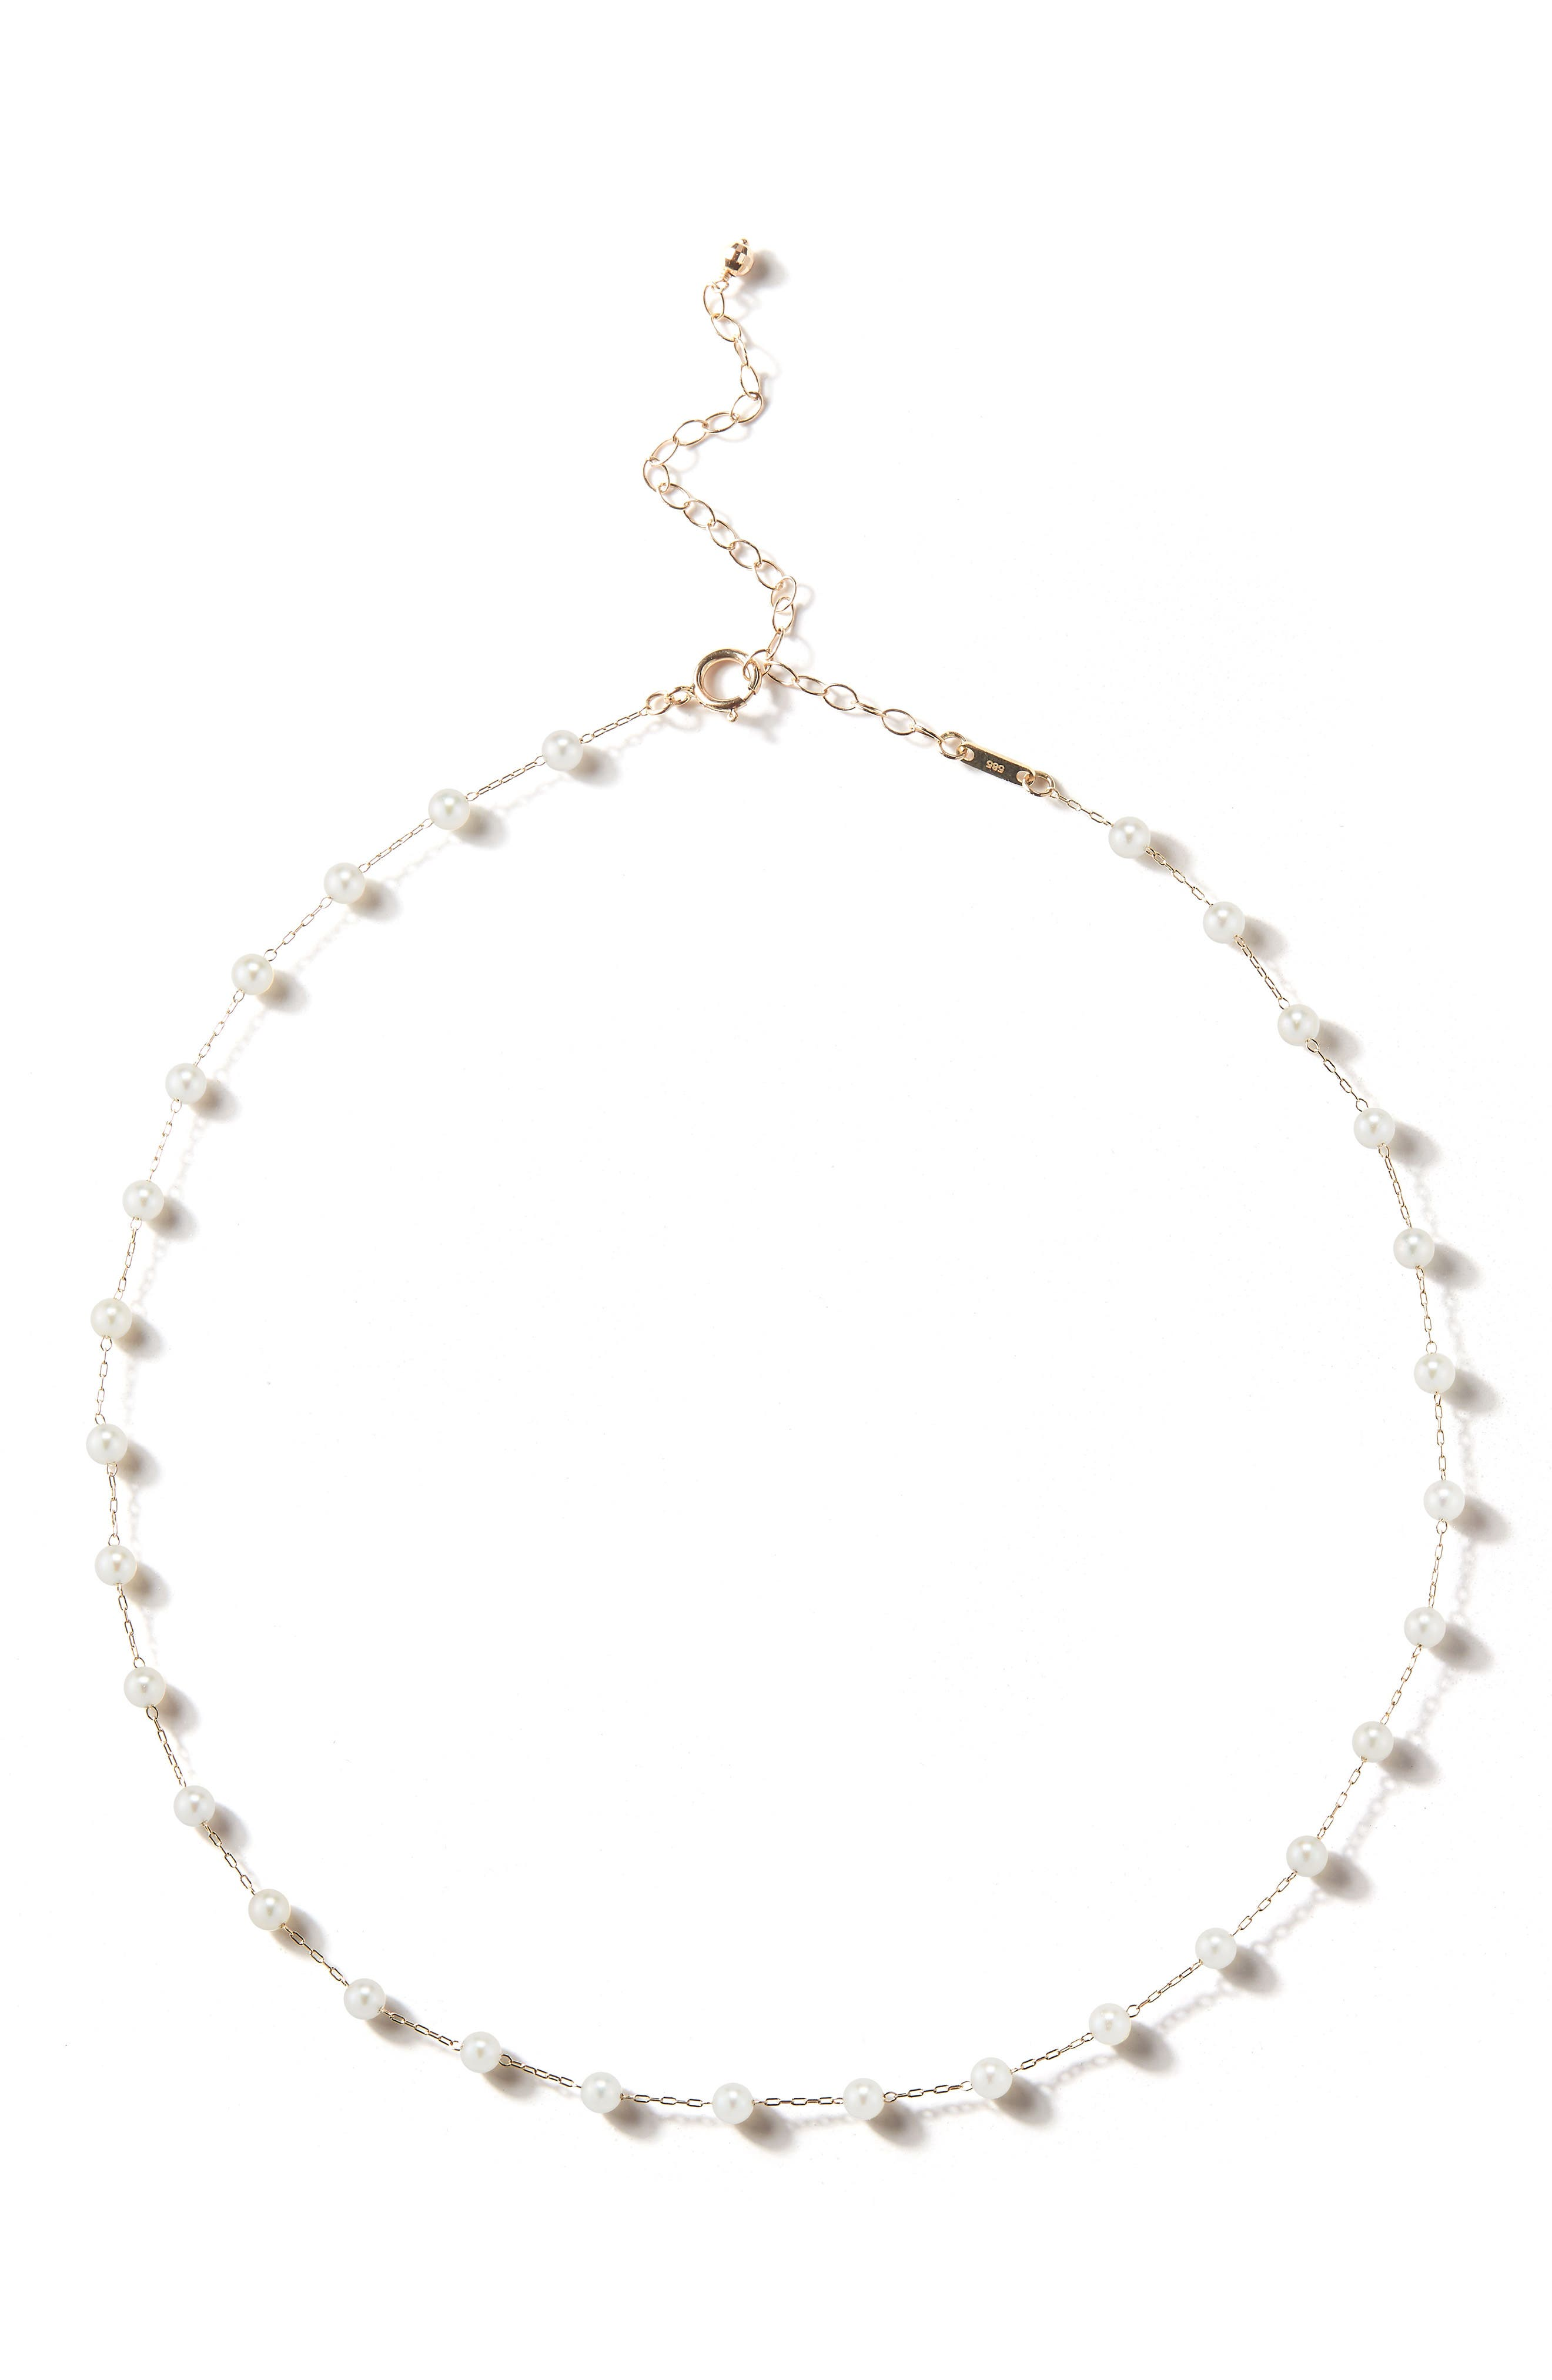 Pearl Choker Necklace,                             Main thumbnail 1, color,                             Yellow Gold/ Pearl